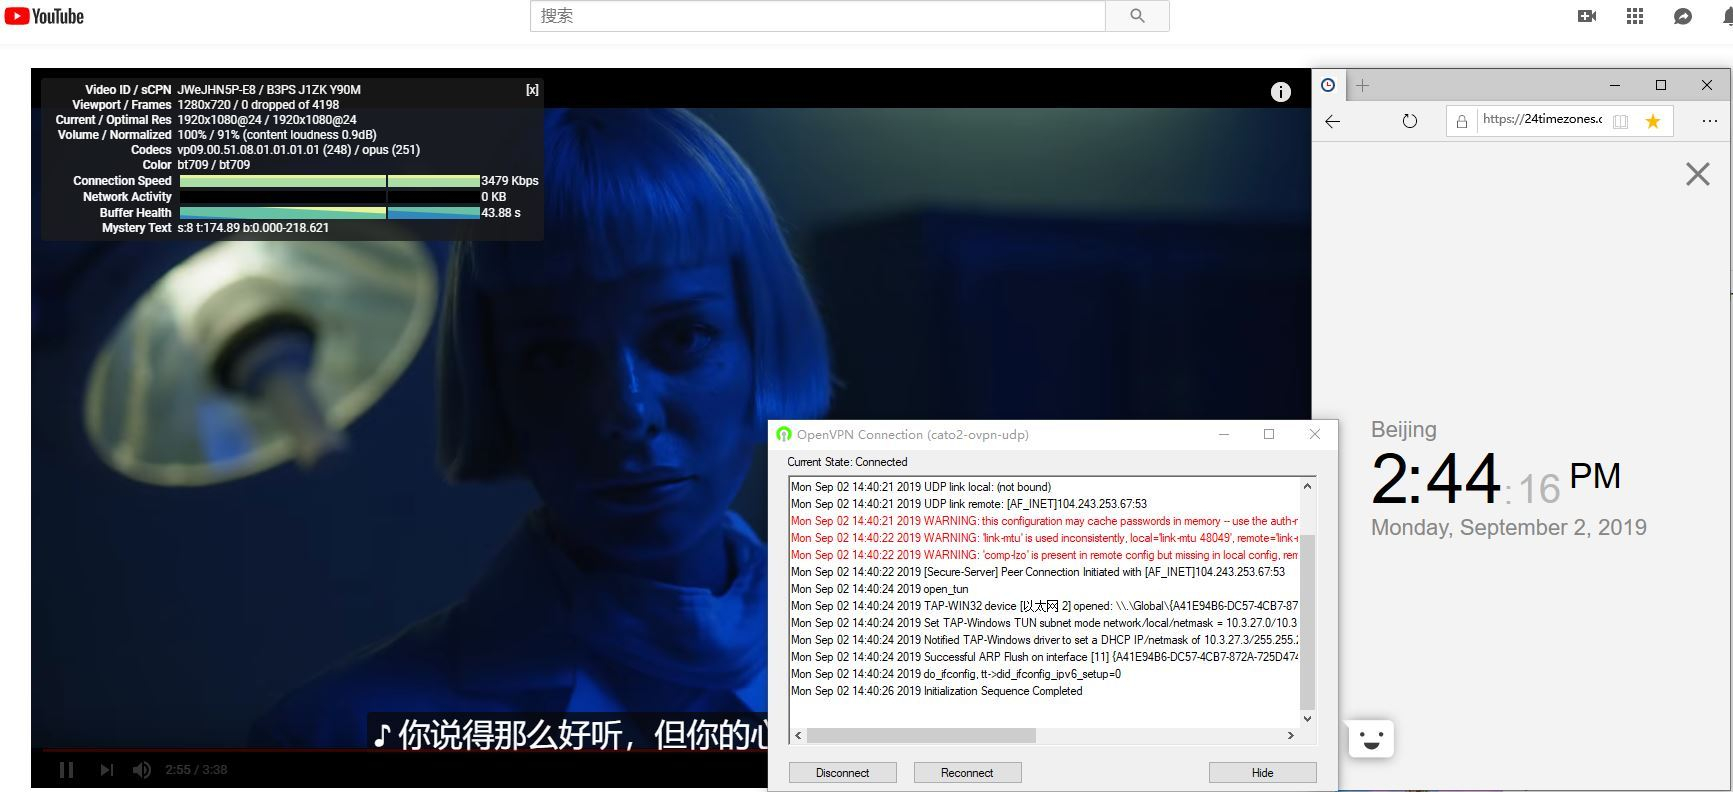 ivacyvpn windows cato2-udp 服务器 中国翻墙 科学上网 YouTube测速-20190902